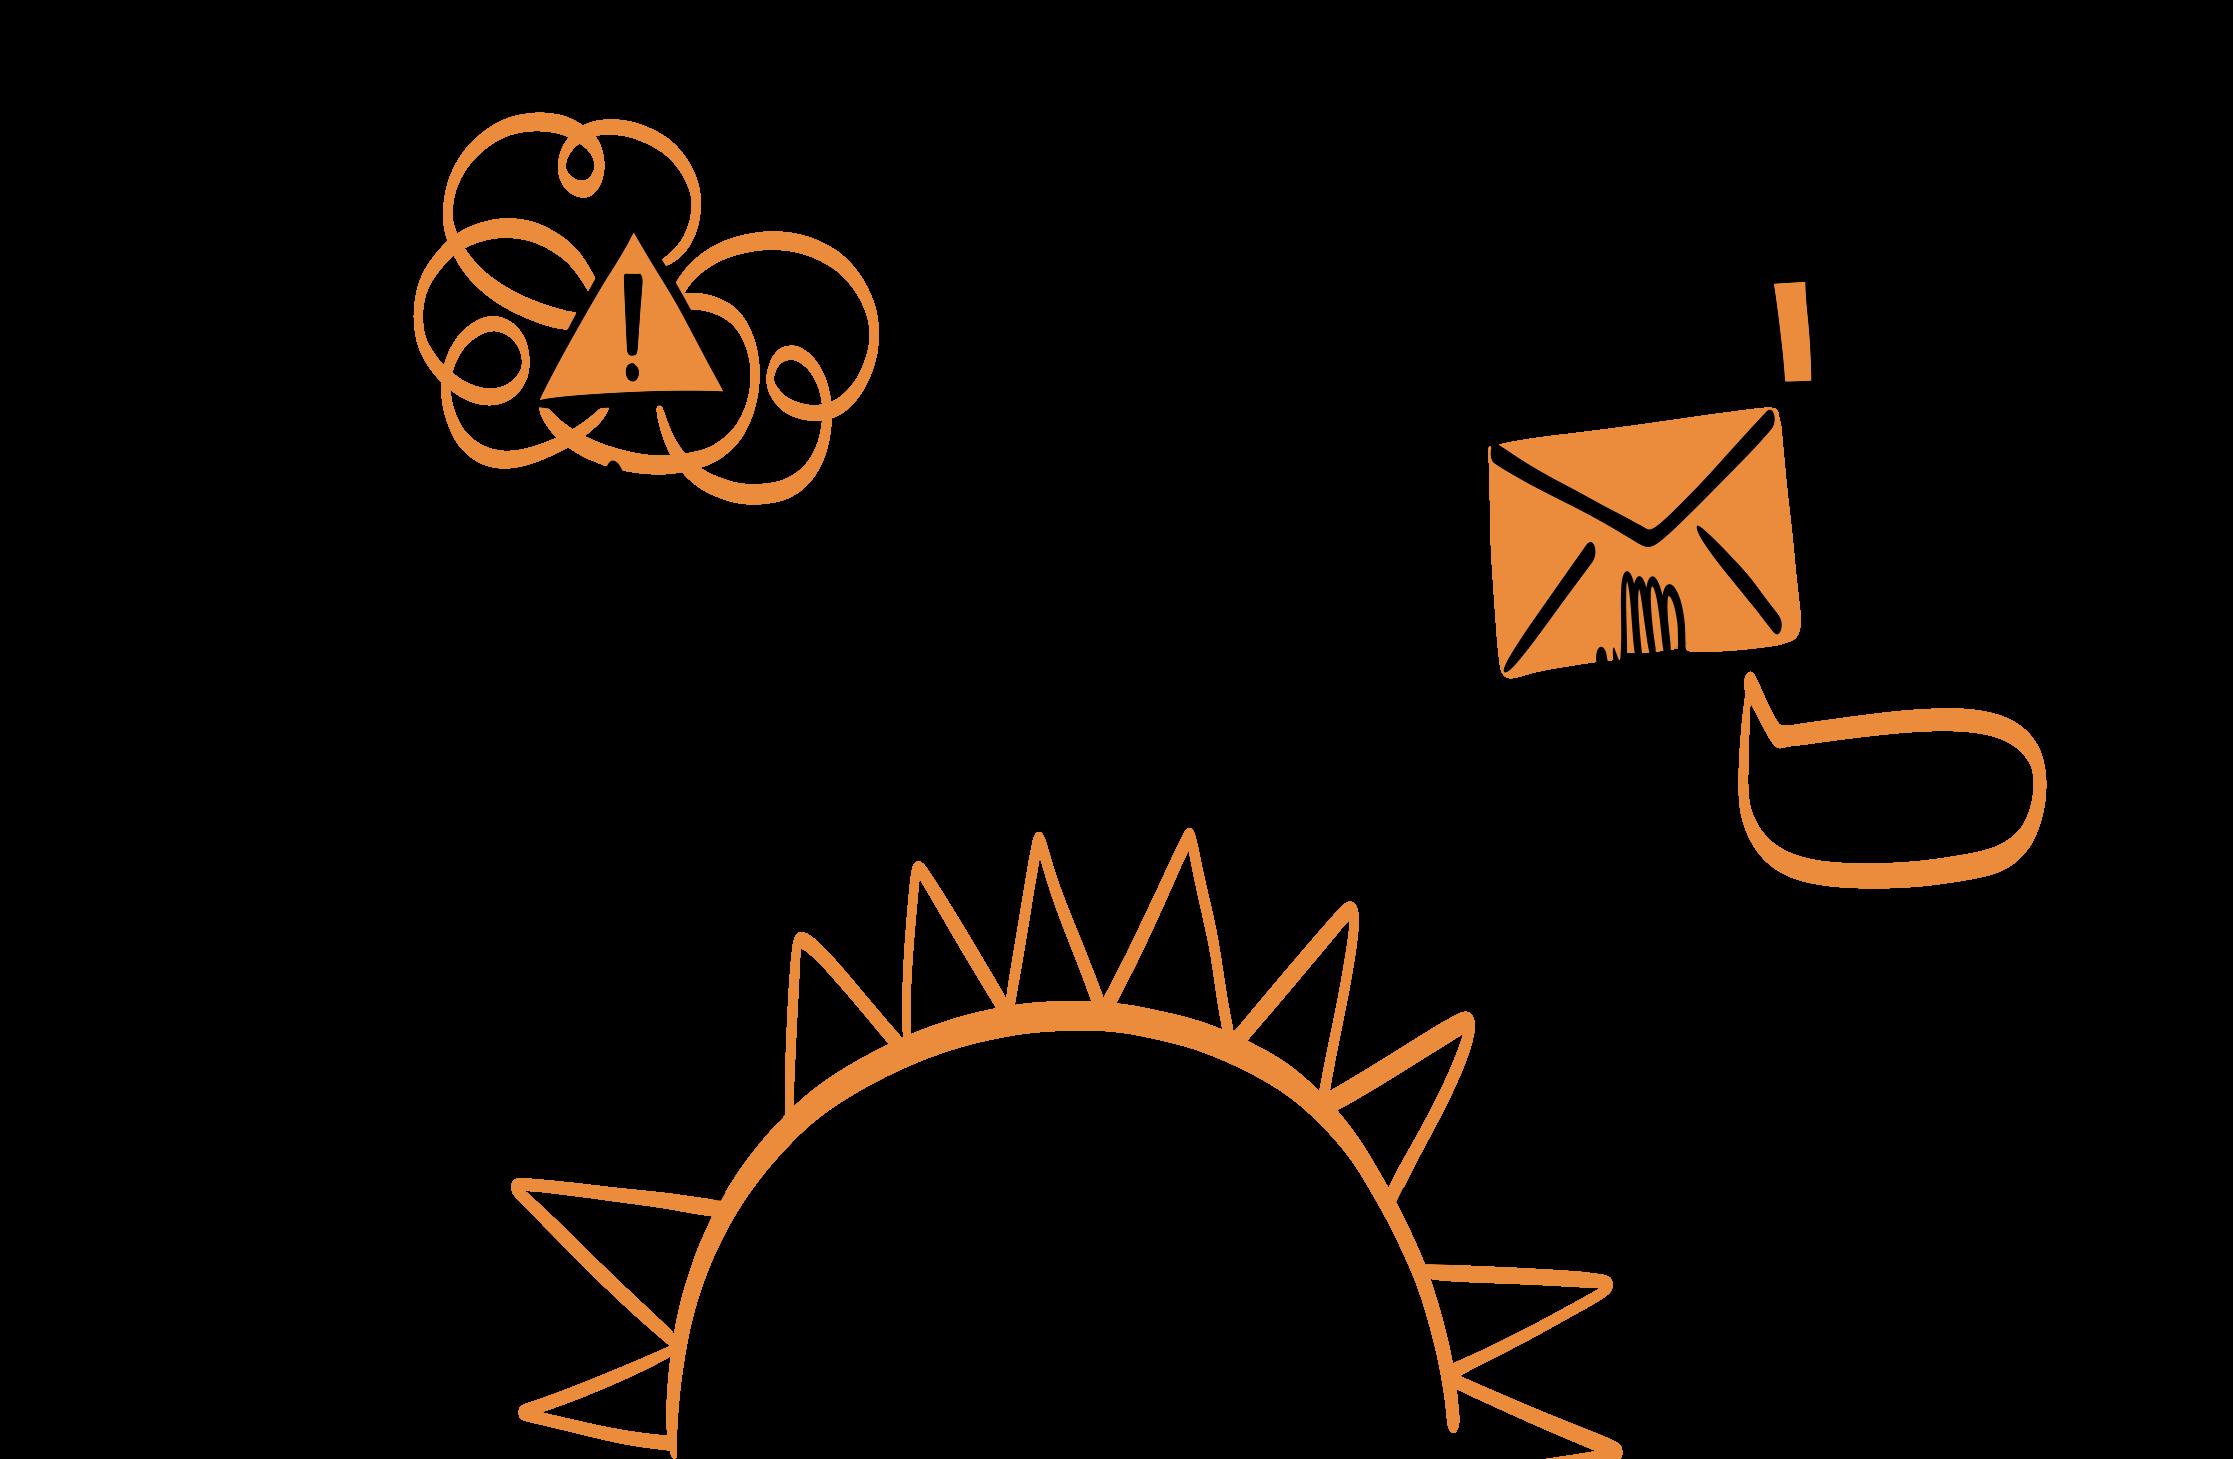 [foundkit]-[web illustration]-[sketches] 10